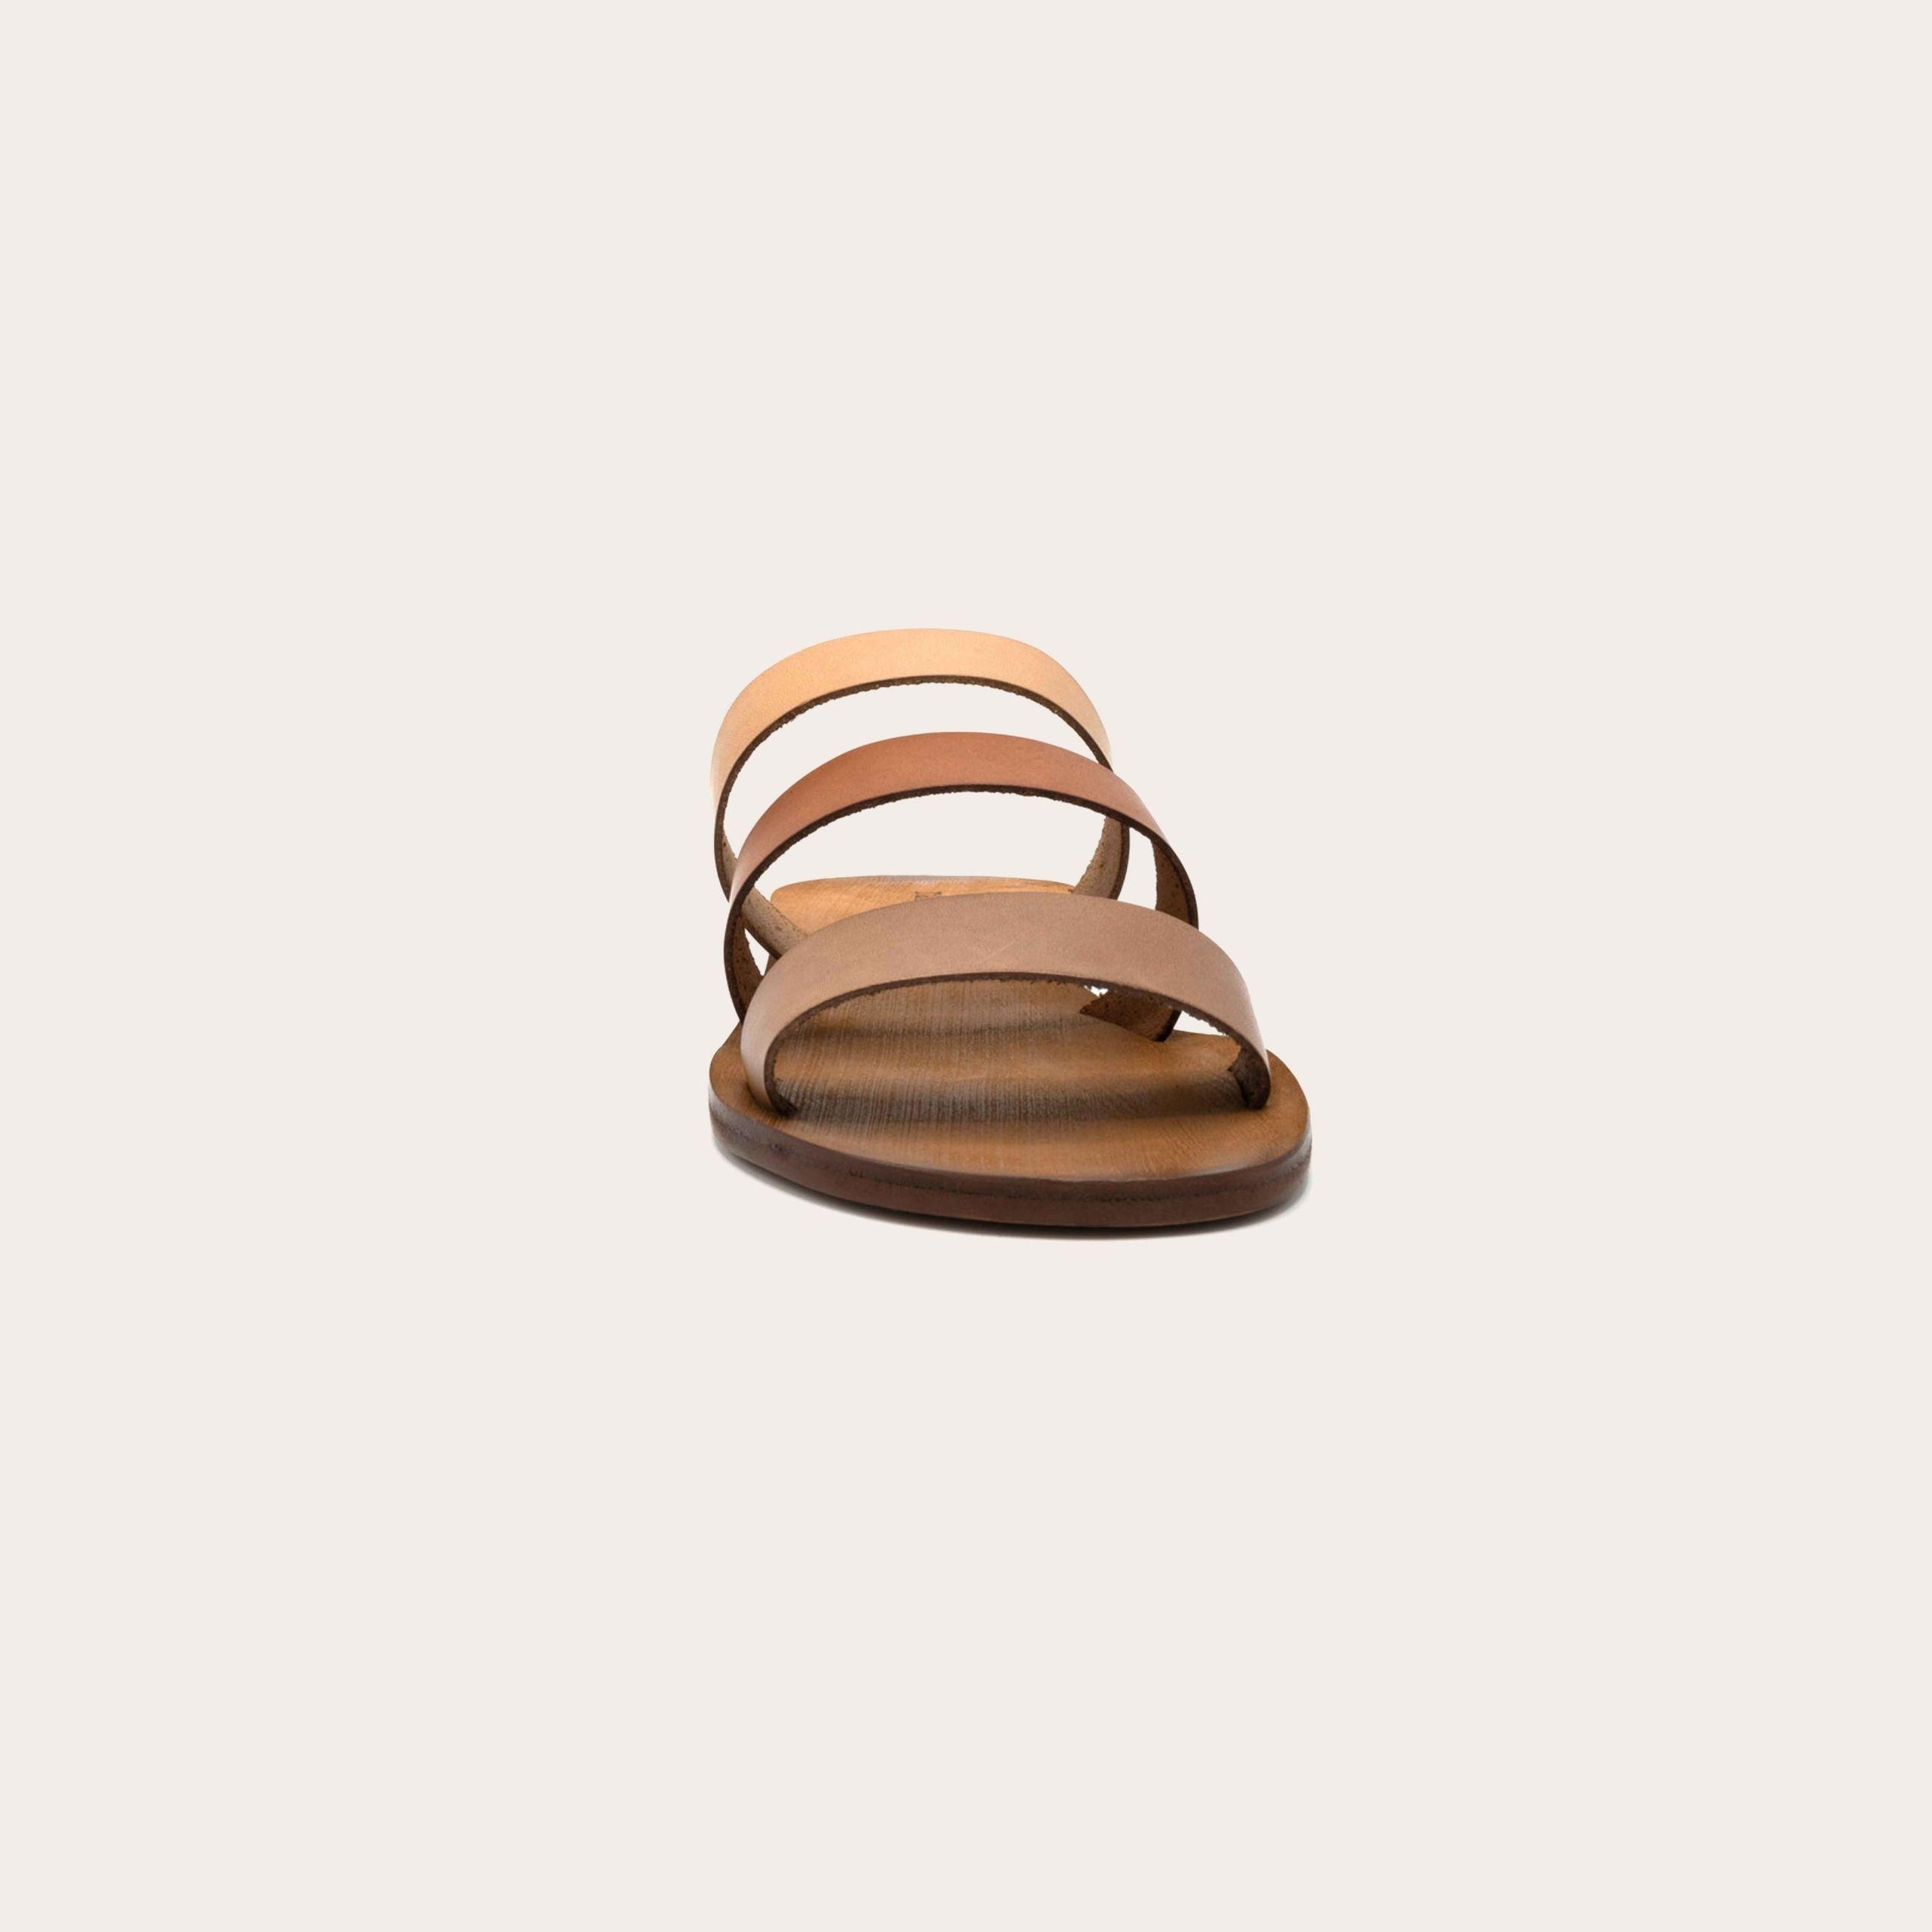 tijuana_4_lintsandalen sandals travelsandals vegan sustainable sandals wikkelsandalen